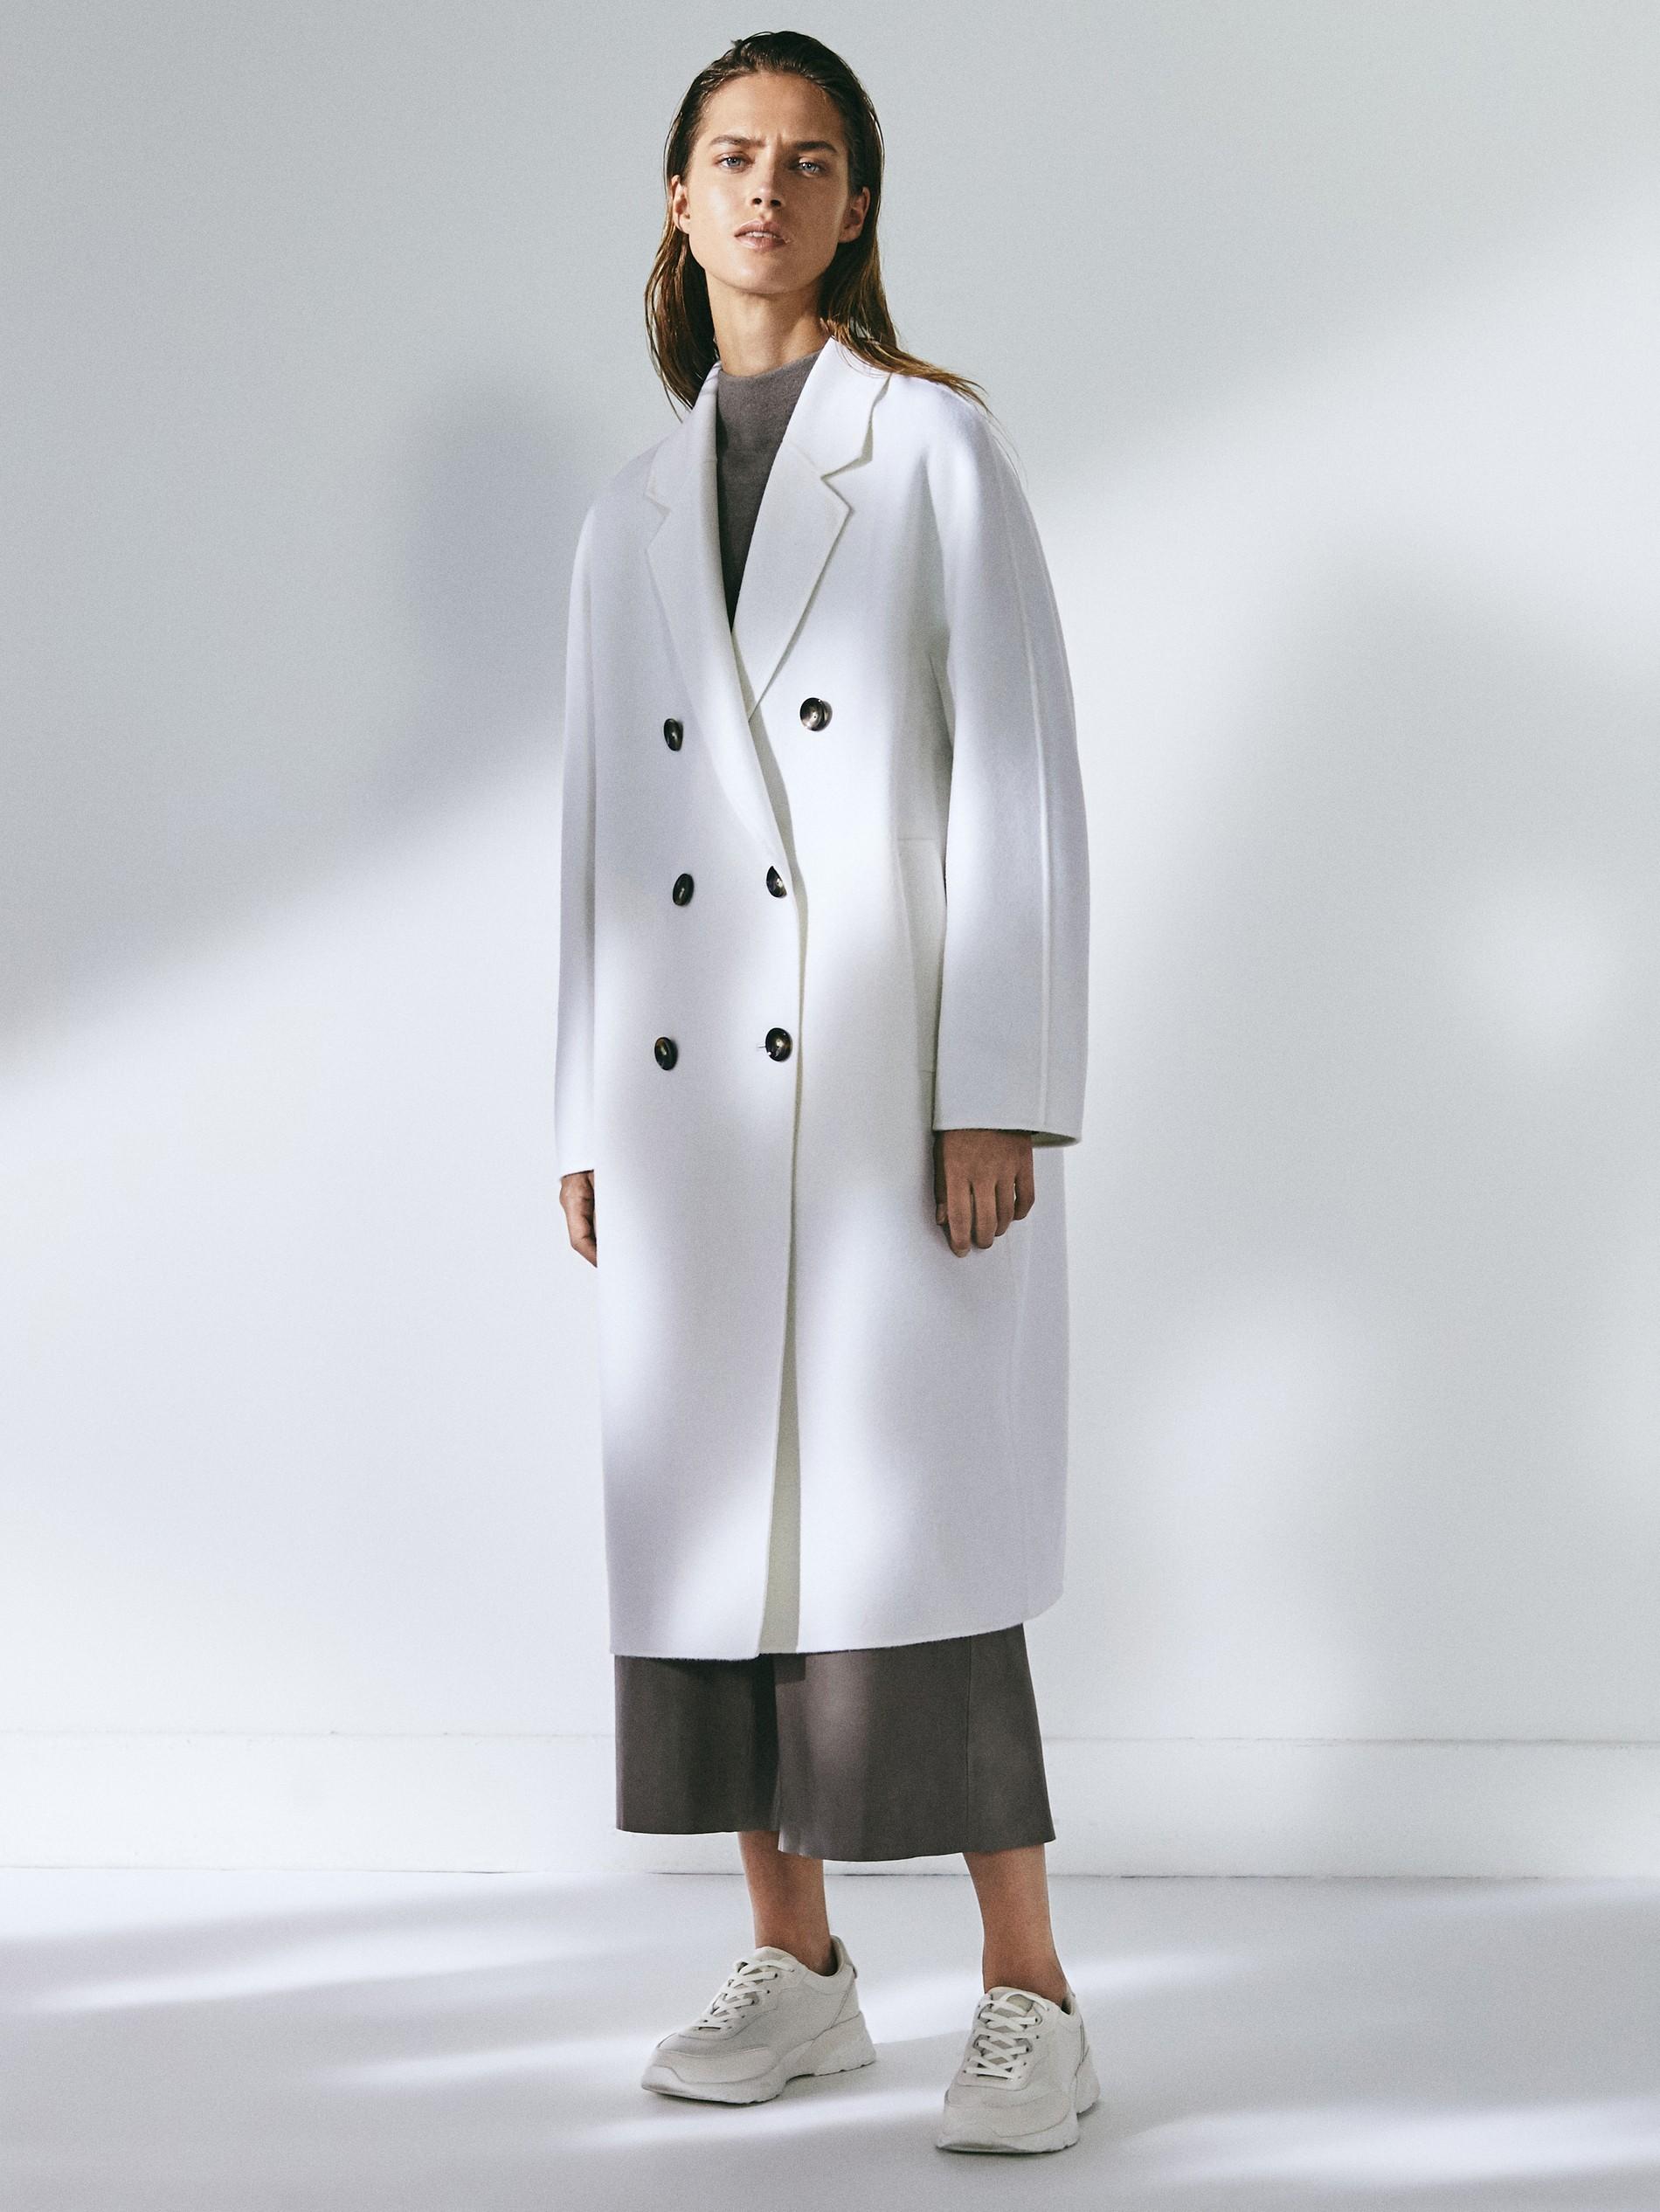 abrigo handmade confeccionado en lana